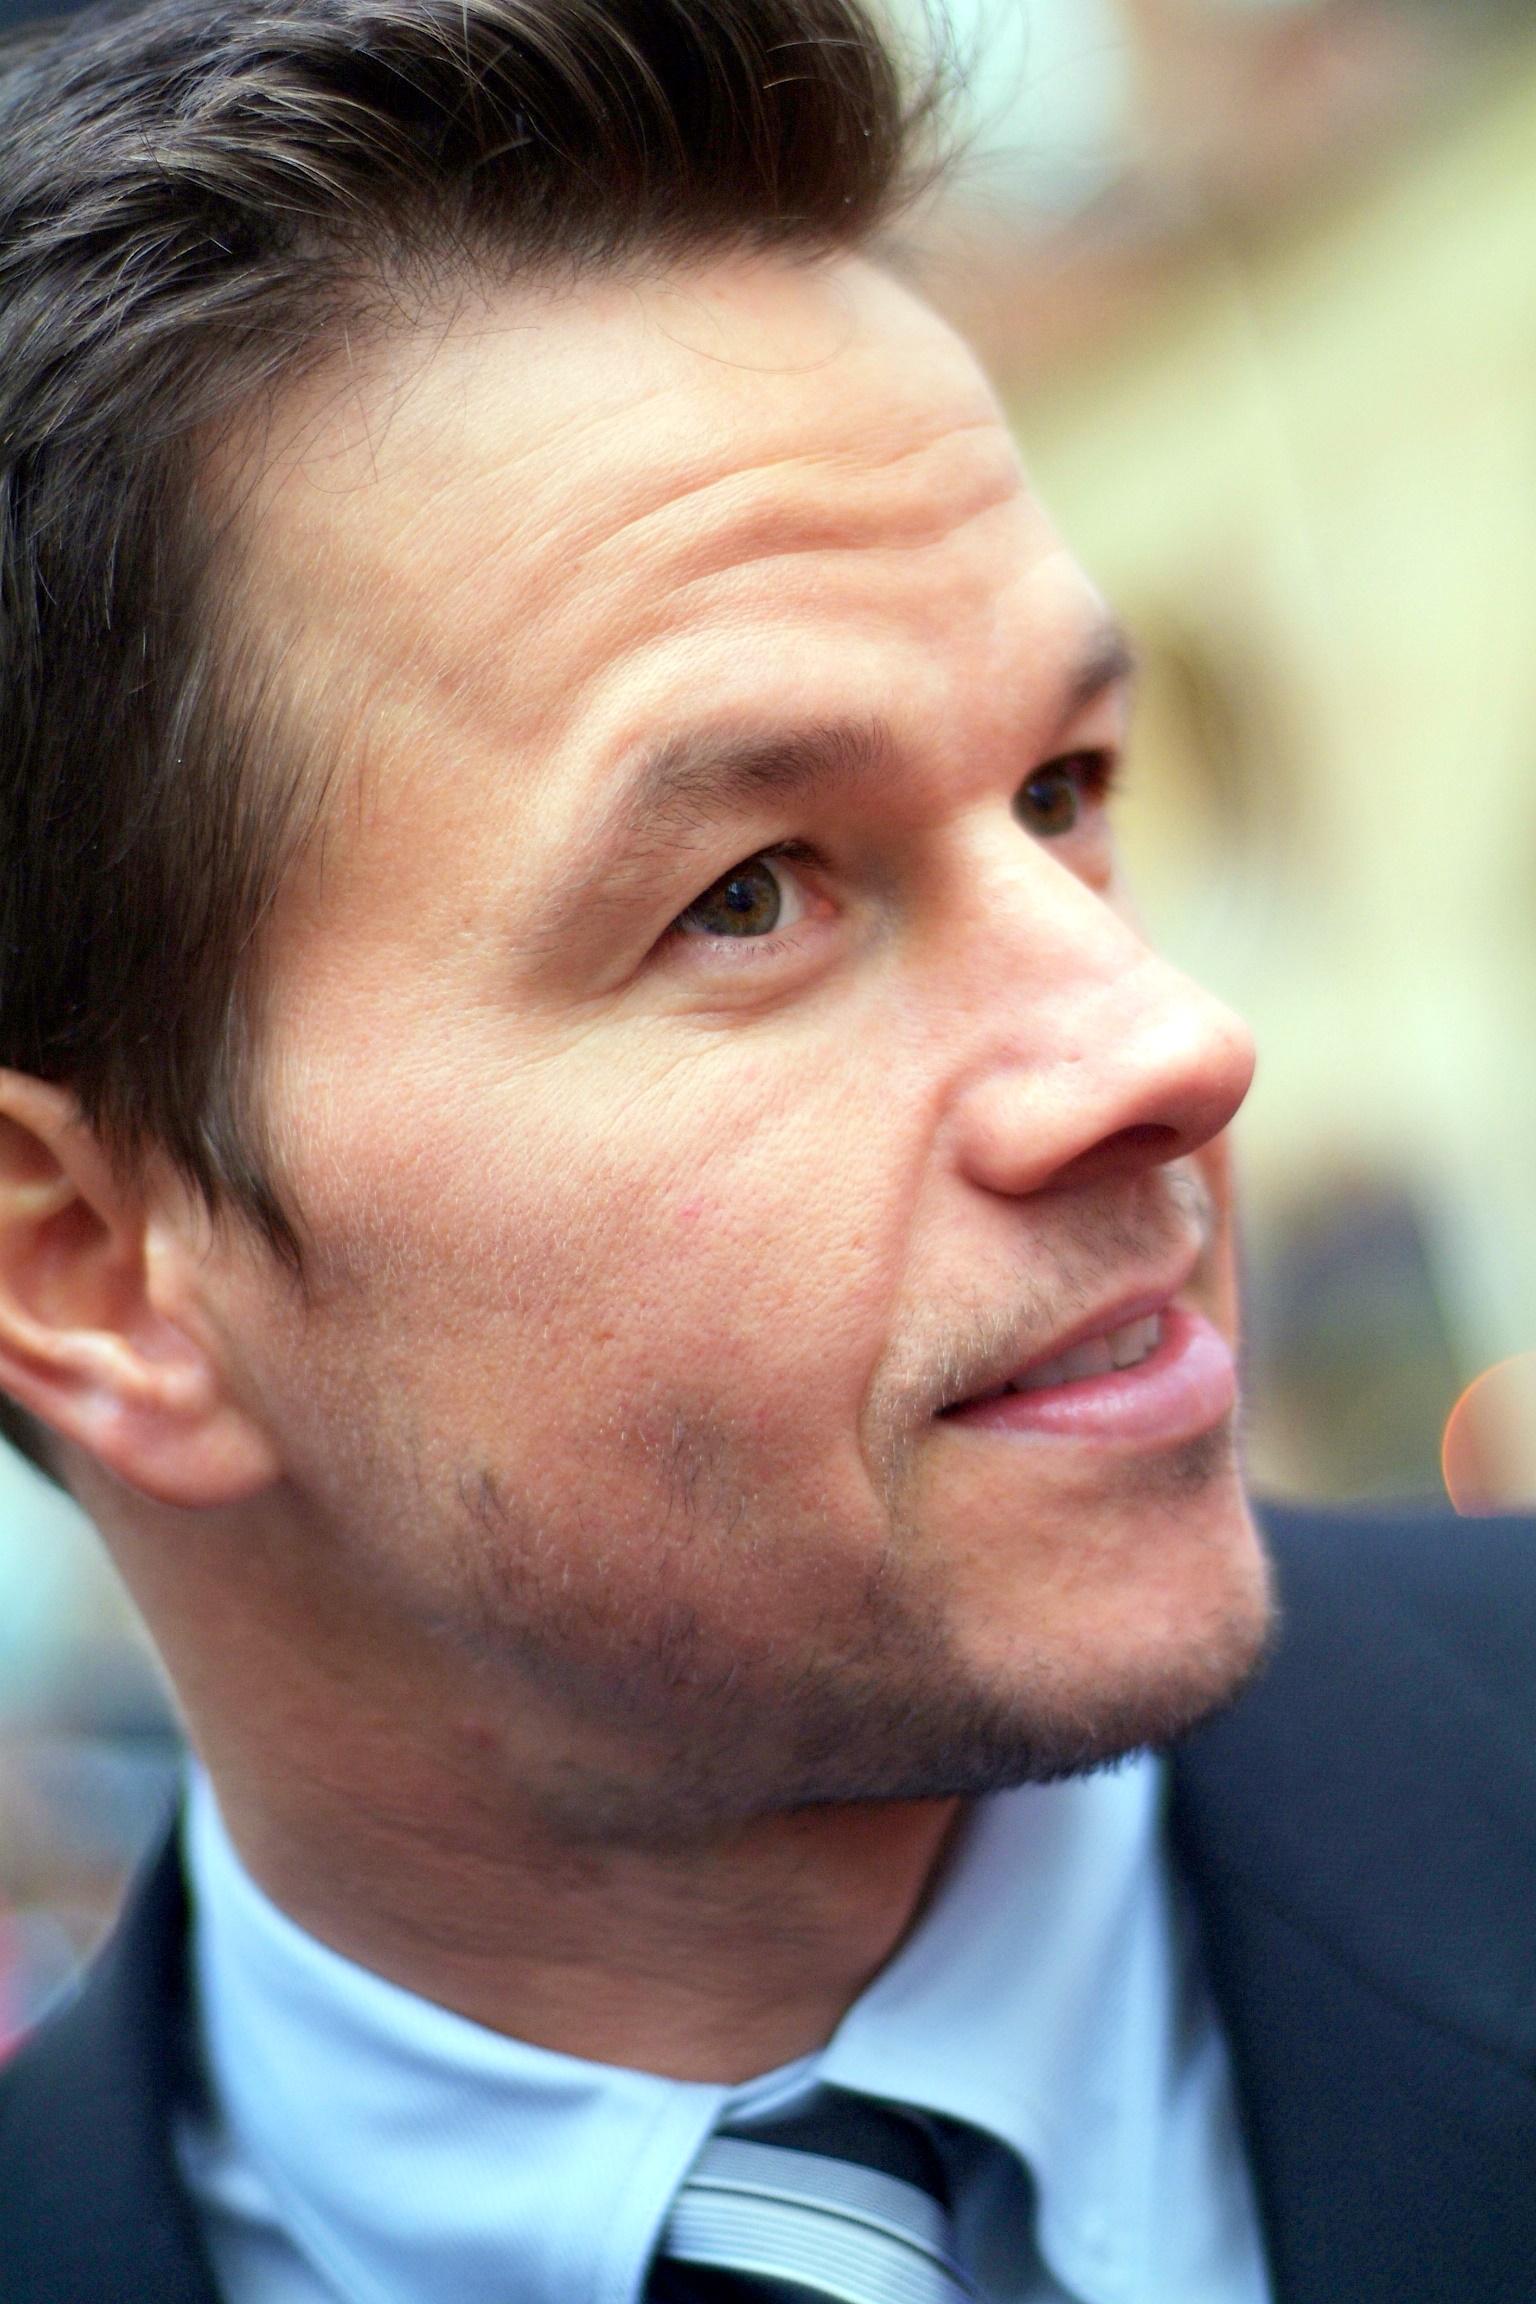 File:Mark Wahlberg 2007, 2.jpg - Wikimedia Commons Mark Wahlberg